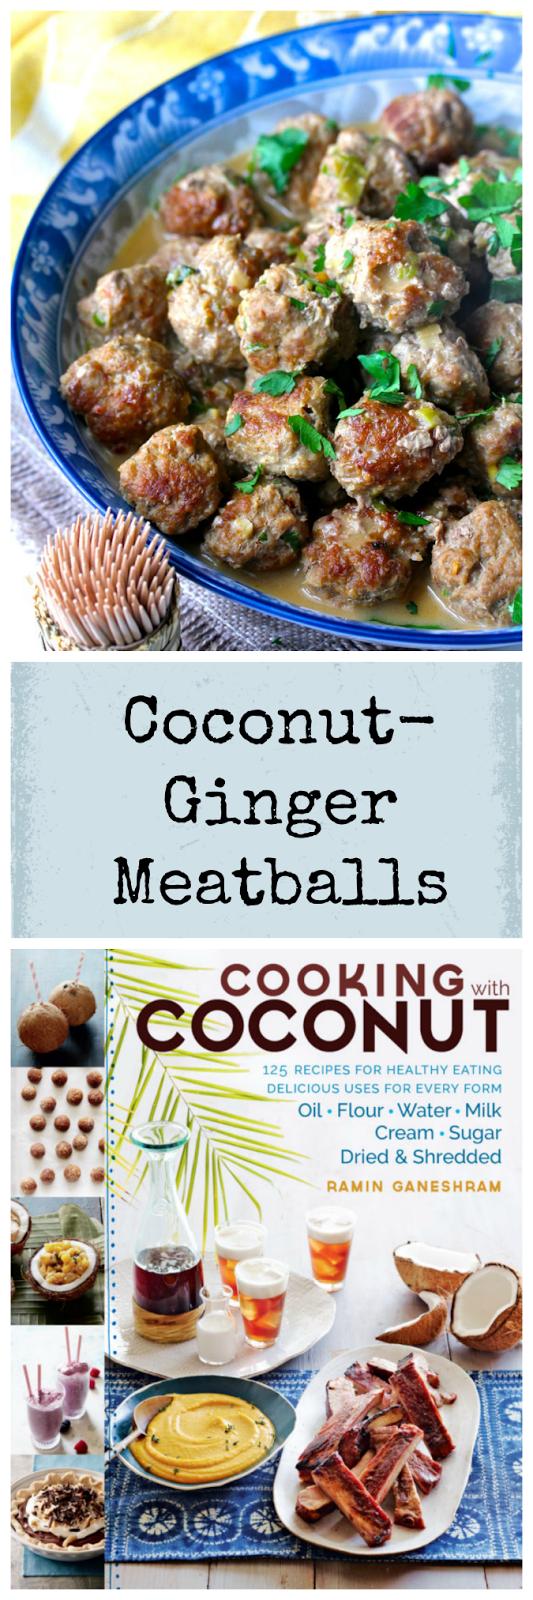 Coconut-Ginger Meatballs